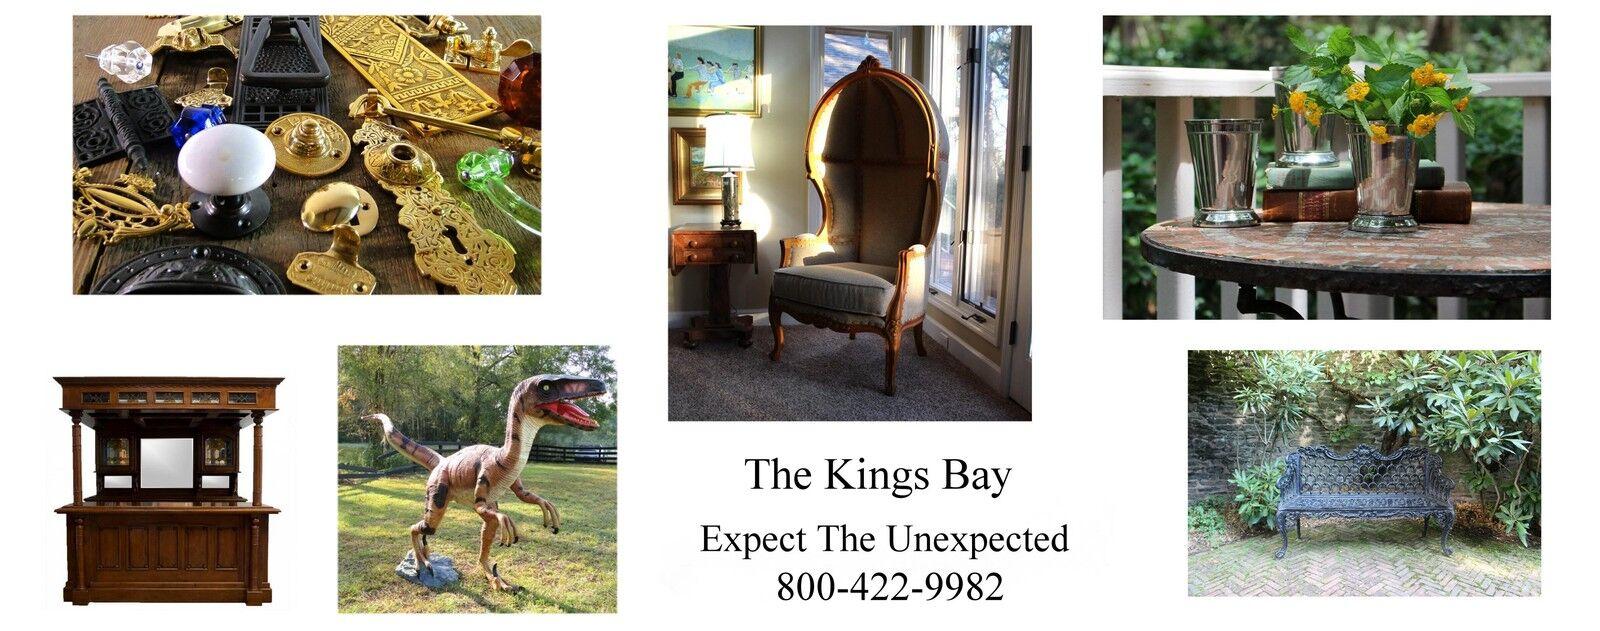 The Kings Bay dba Purple Bomb LLC